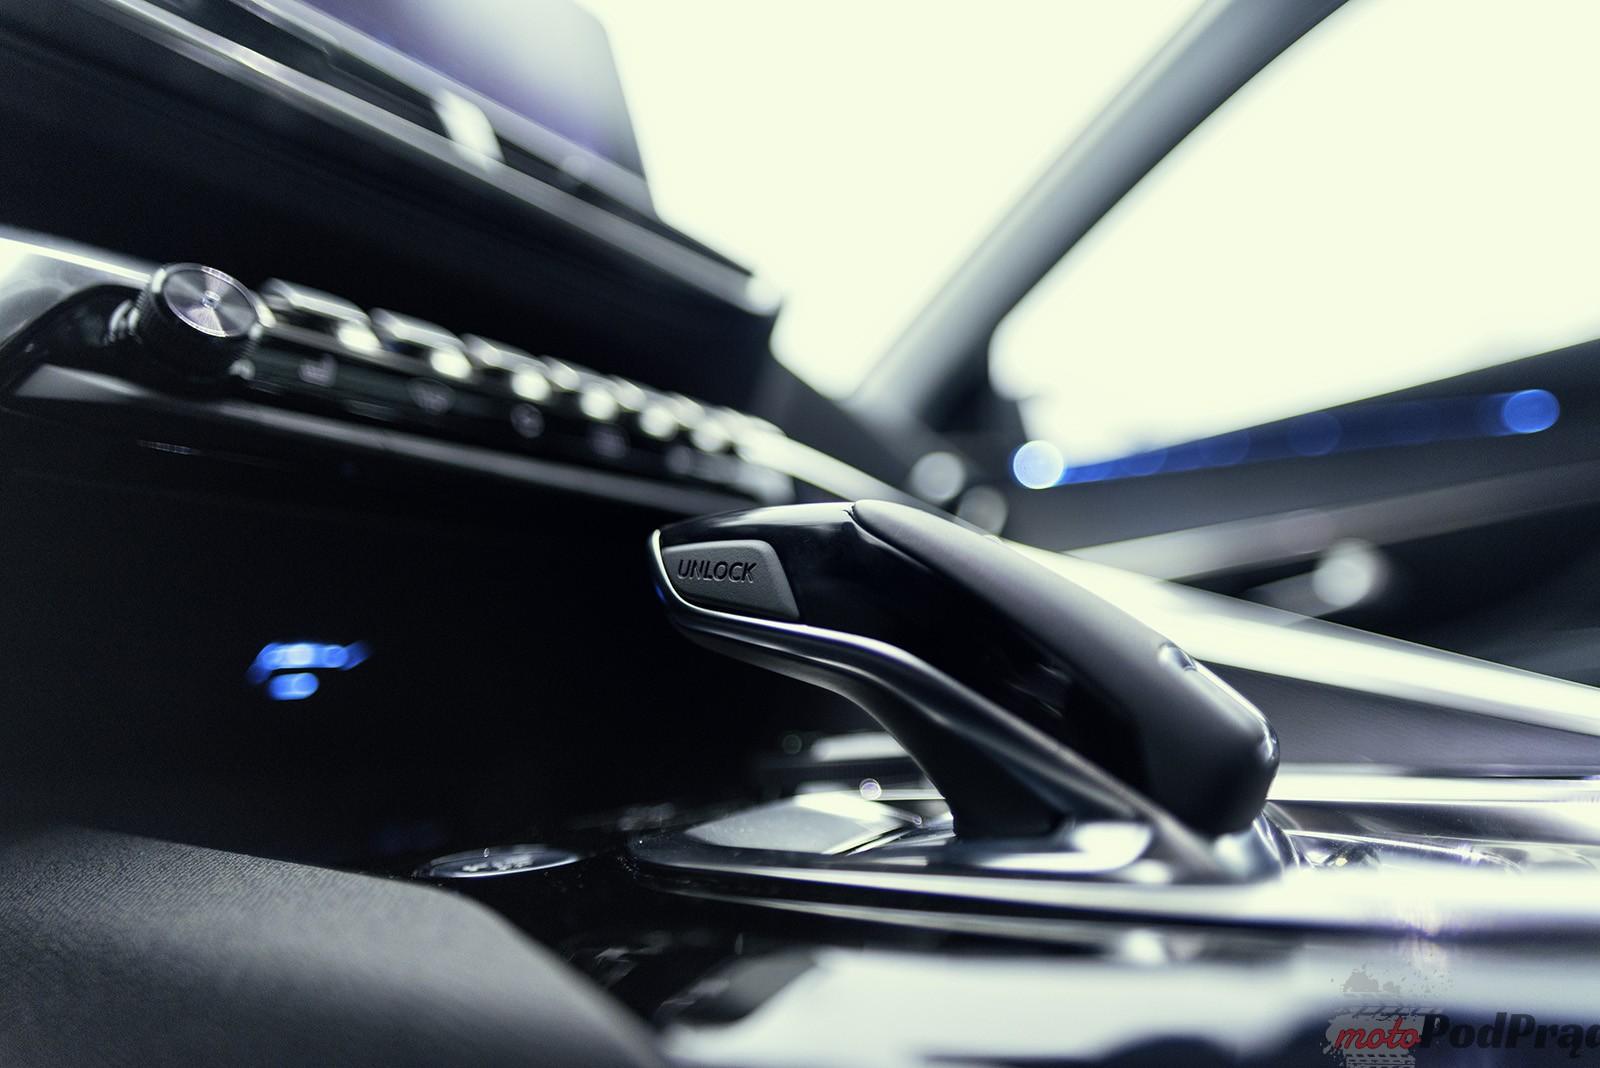 Peugeot 3008 37 Test: Peugeot 3008 1.6 THP   wirtualny lew